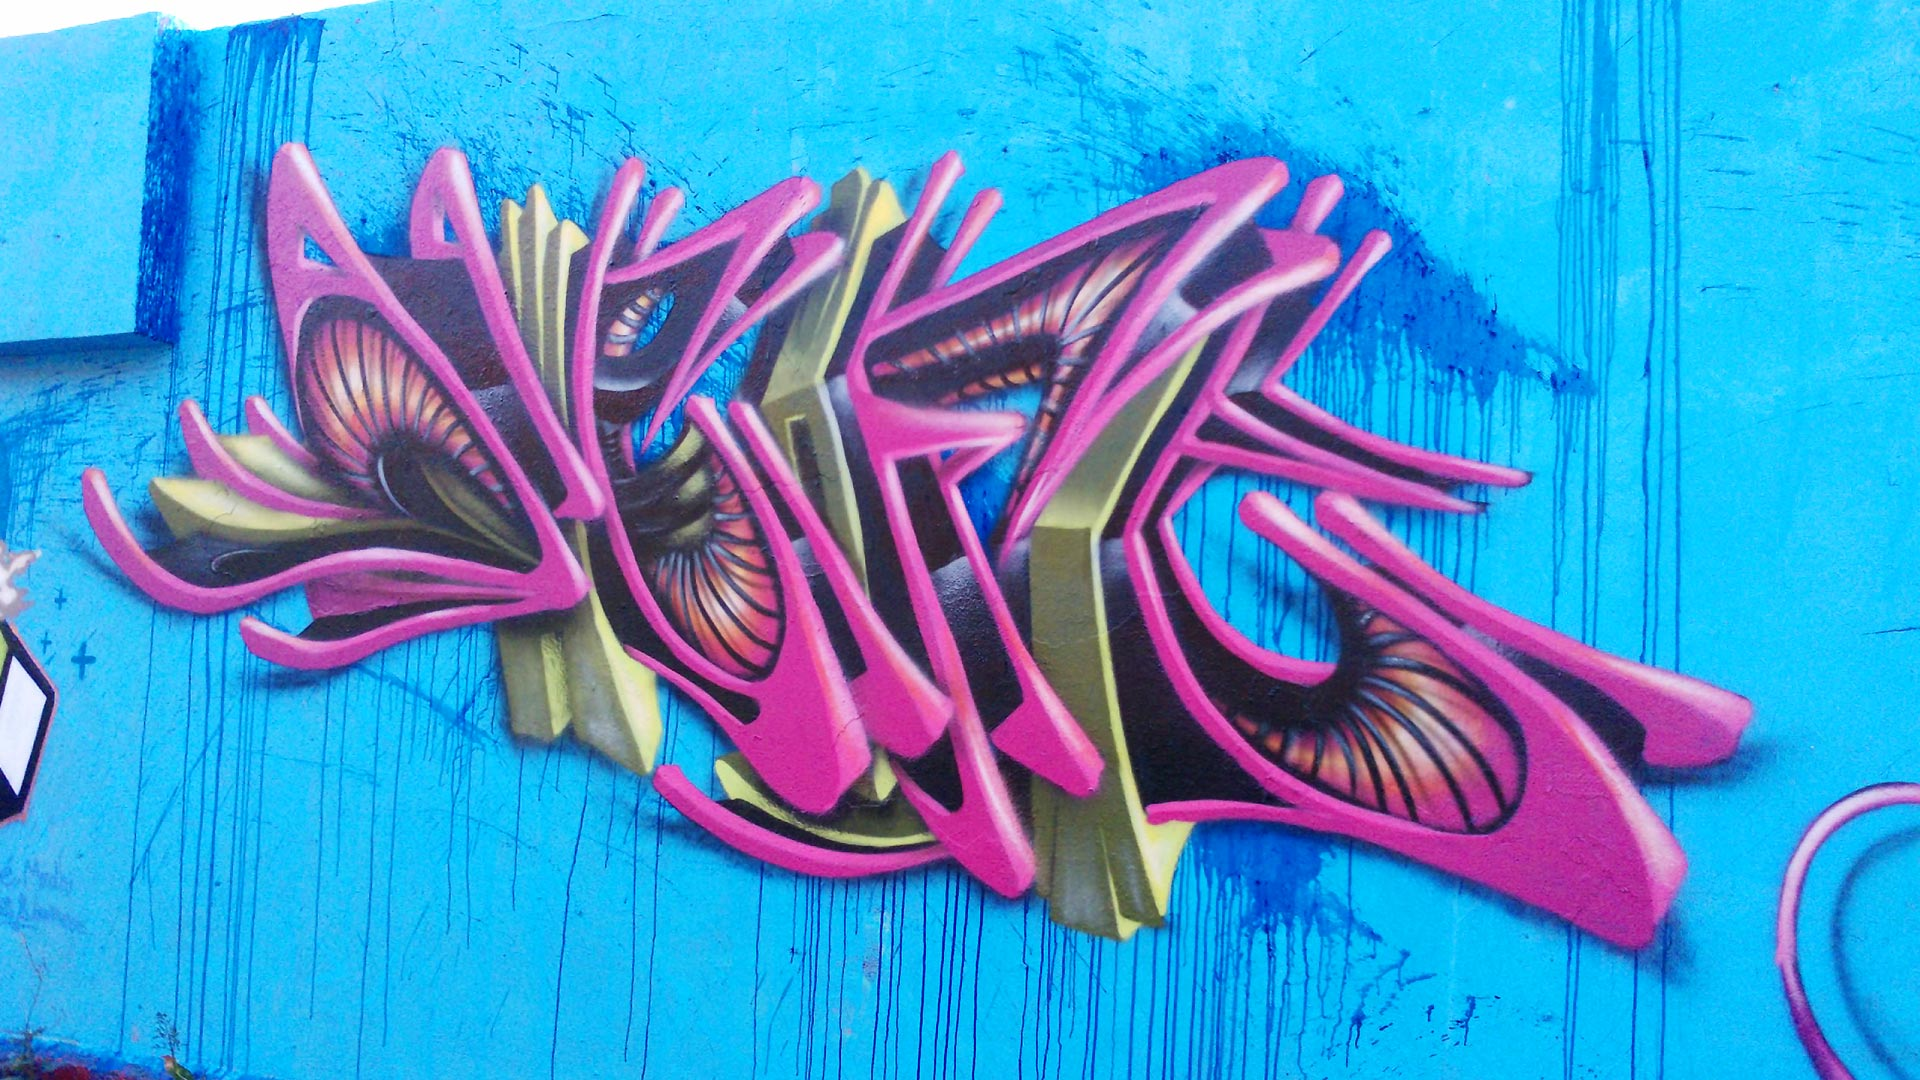 Deft - Graffiti - Clermont-Ferrand  - ENSACF